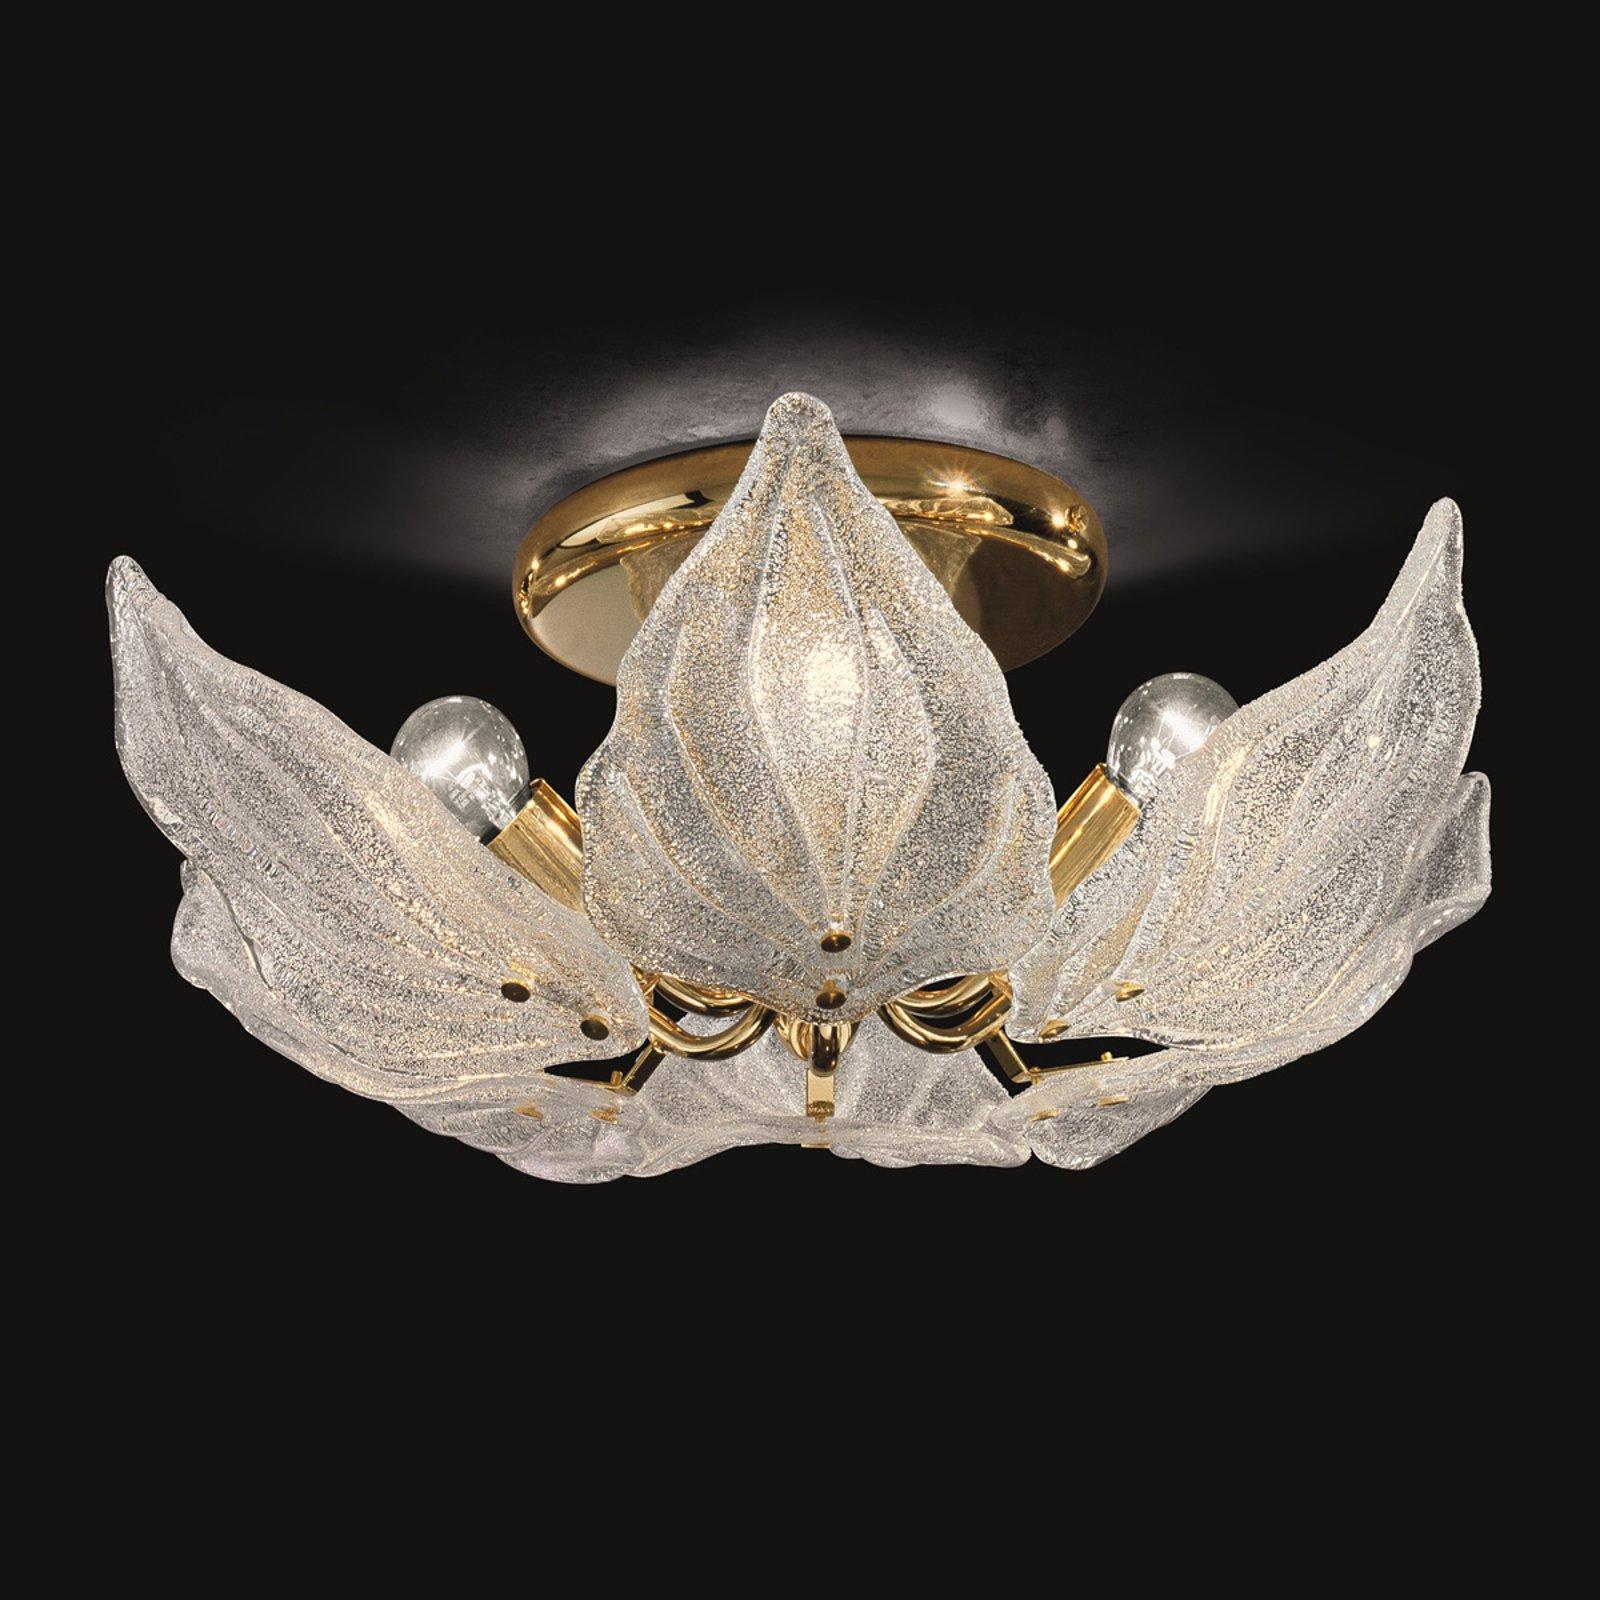 Glass-taklampe Foglie, seks lyskilder